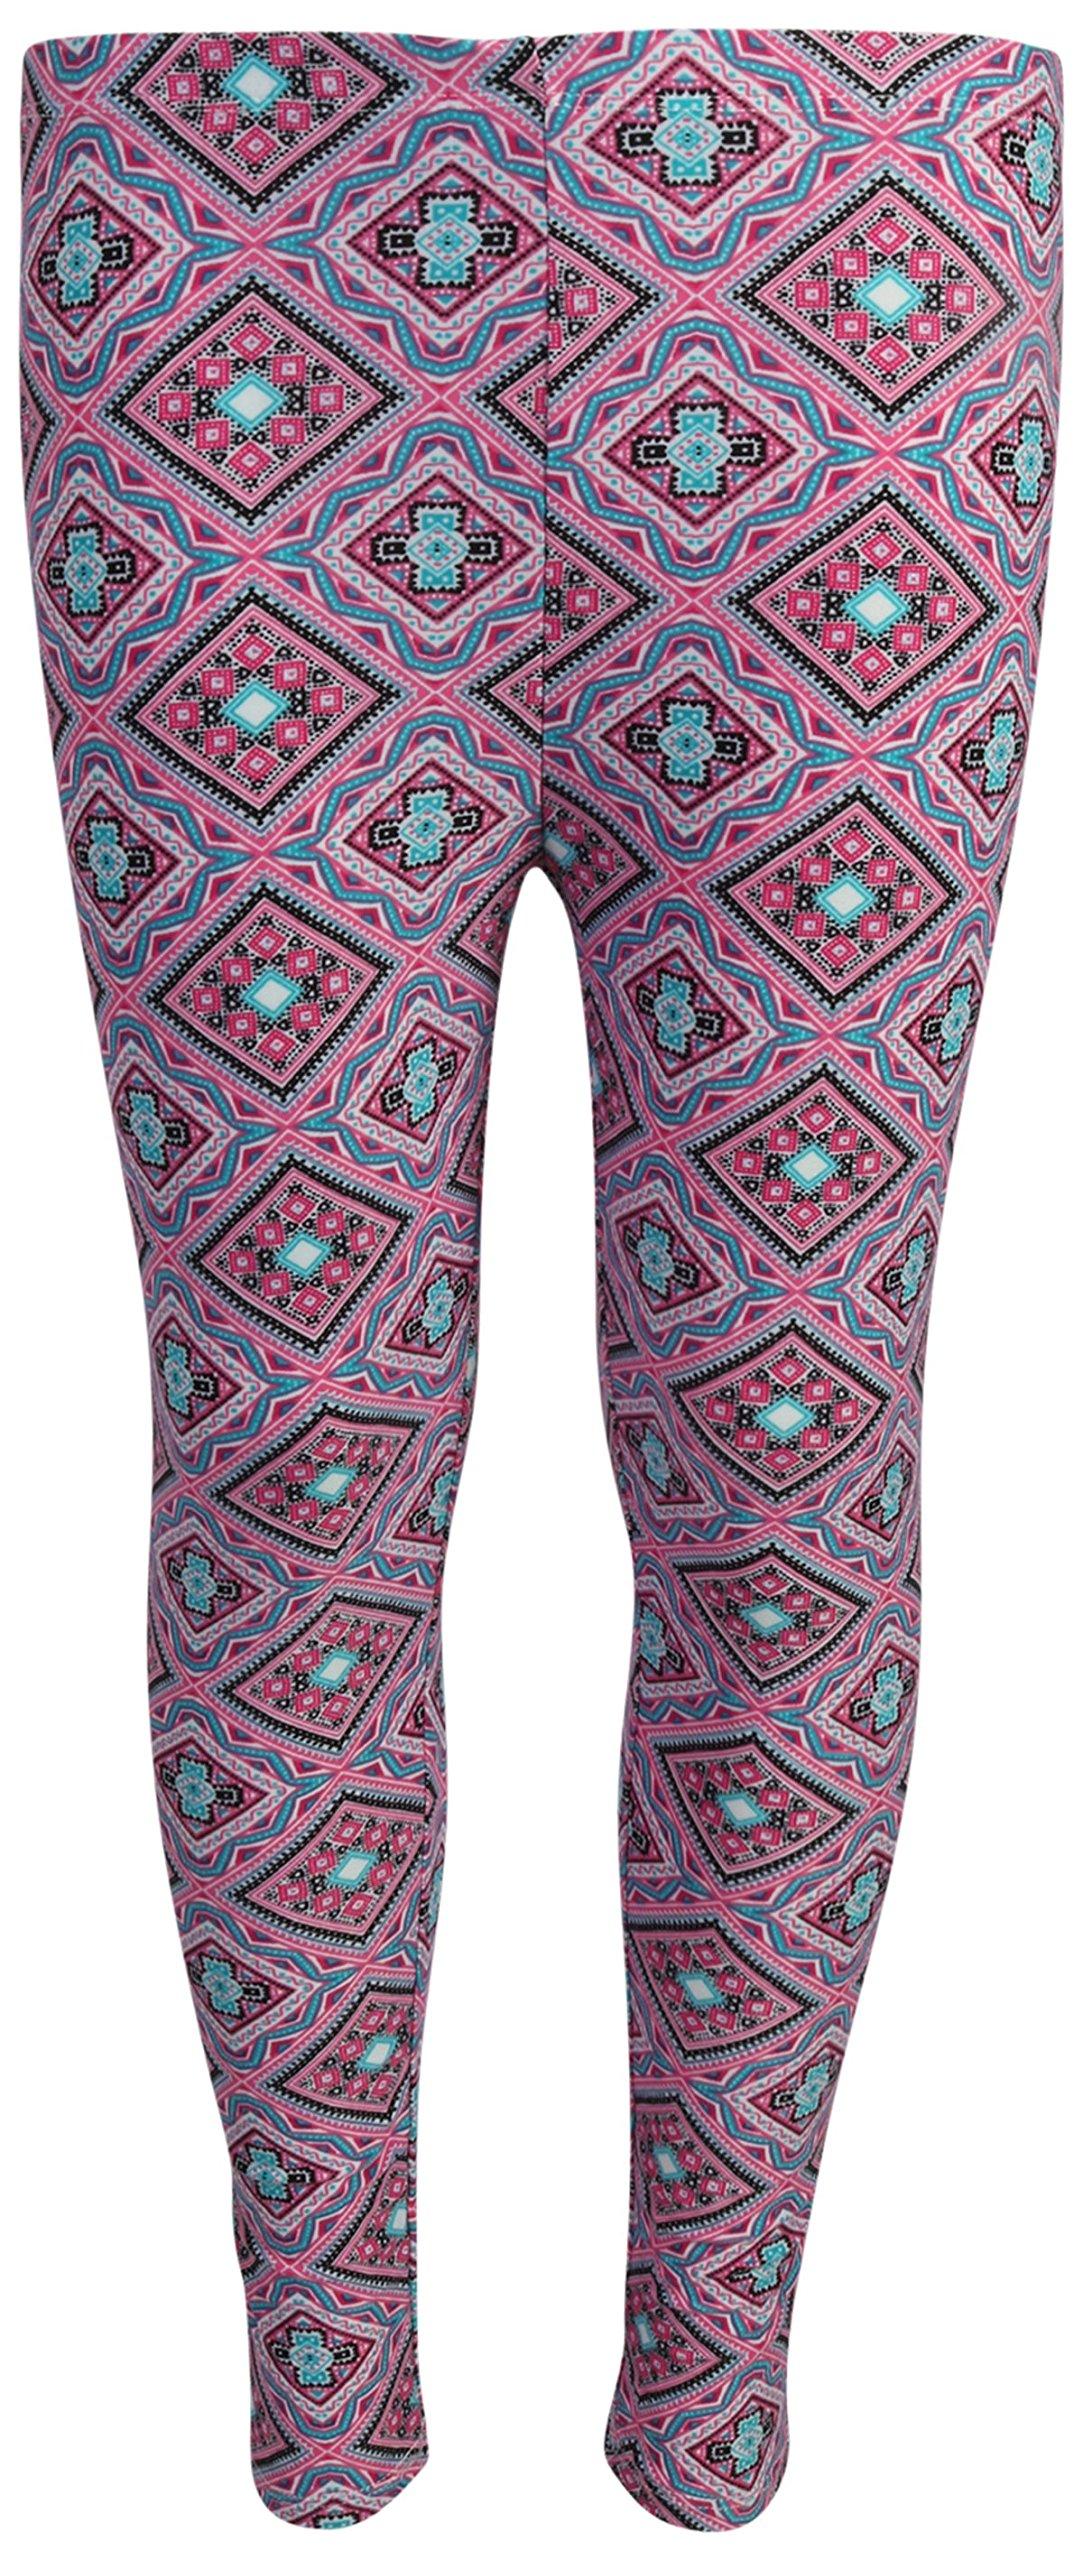 dELiA*s 'dELiAs 4 Pack Girl's Basic Yummy Active Leggings, Navy Flower/Diamond, Size 7/8' by dELiA*s (Image #3)